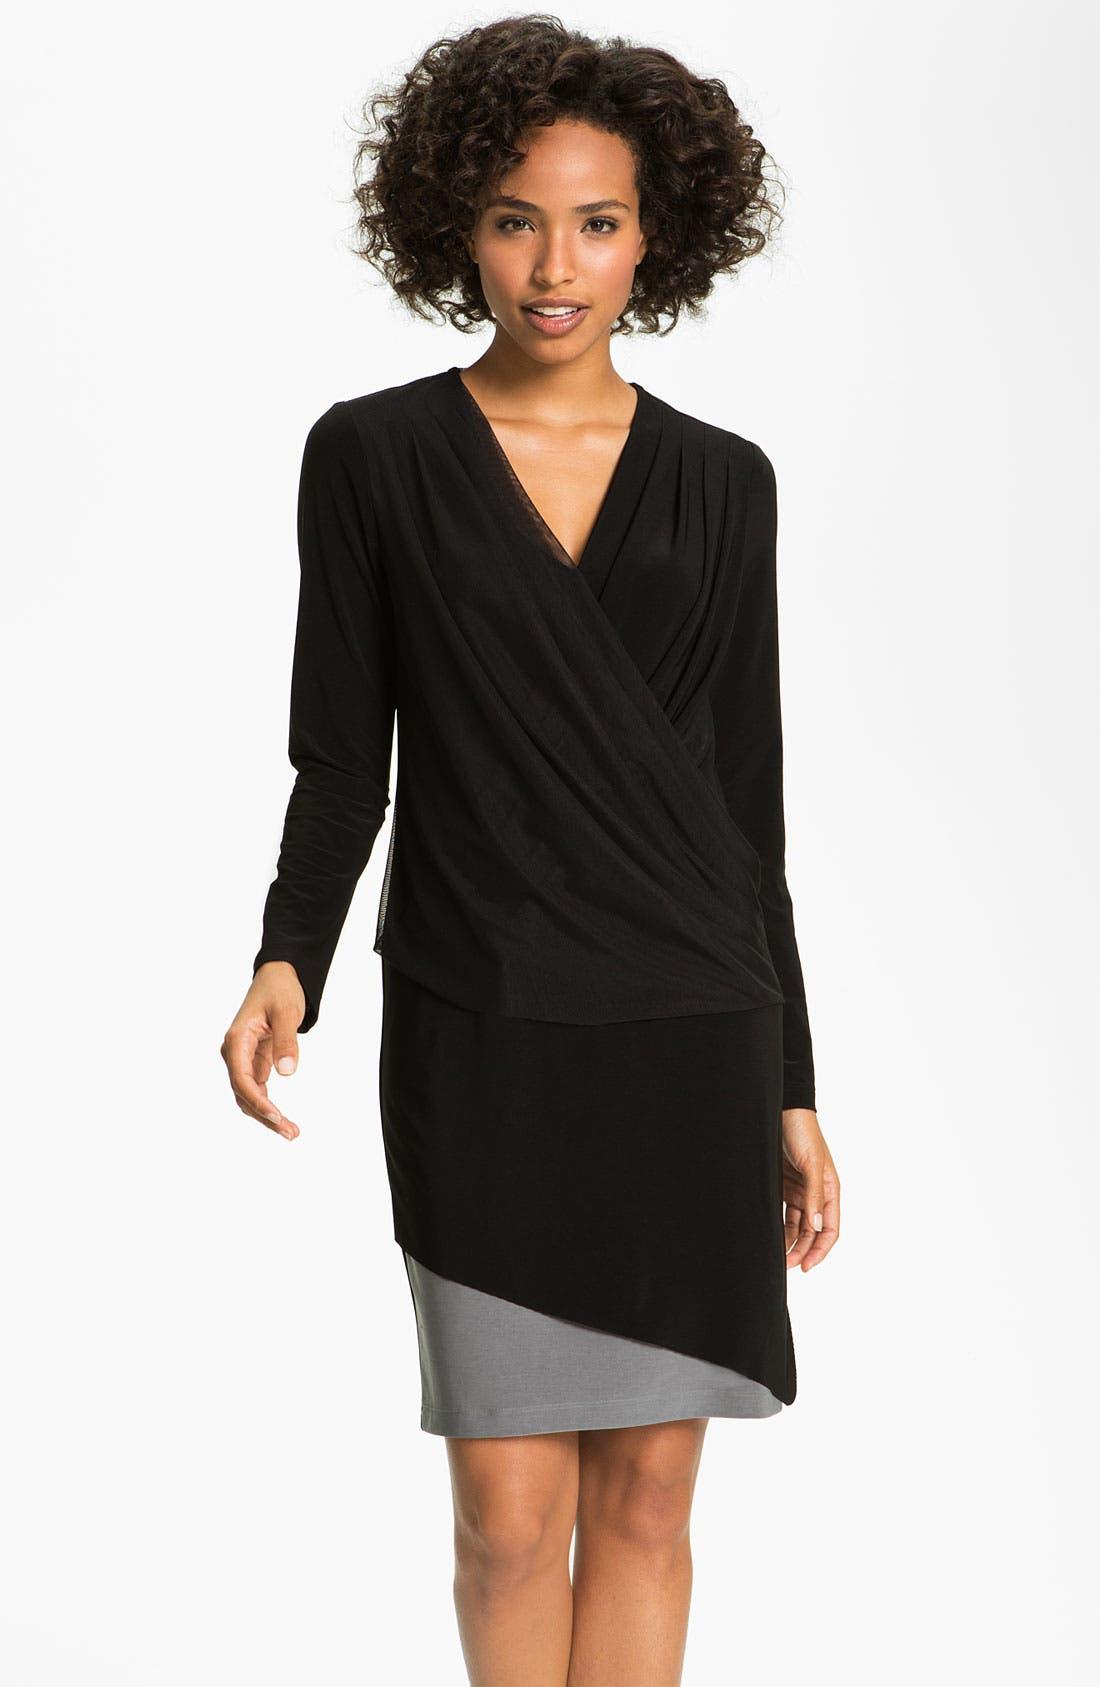 Alternate Image 1 Selected - Alex & Ava Surplice Mesh & Jersey Dress